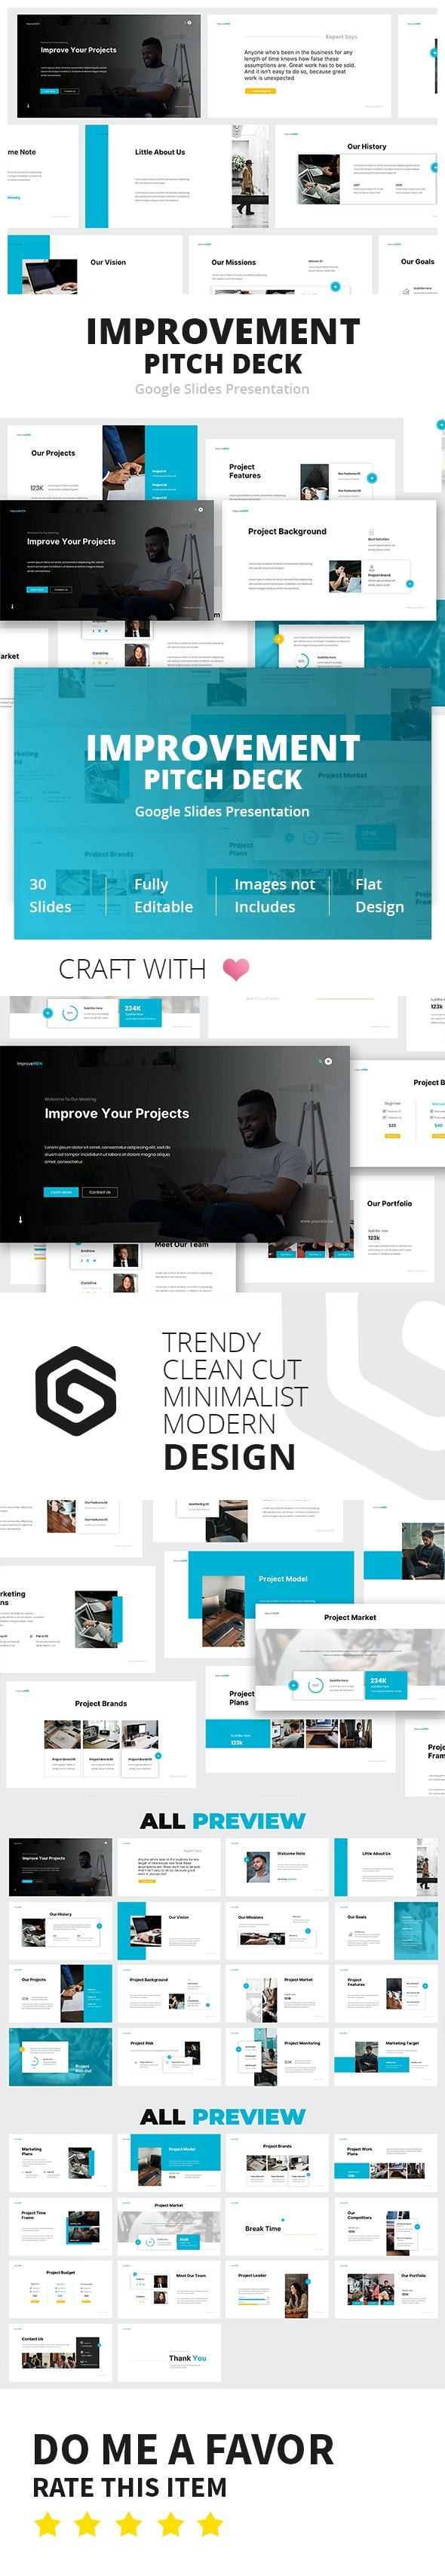 Improvement Pitch Deck Google Slides Template - Google Slides Presentation Templates